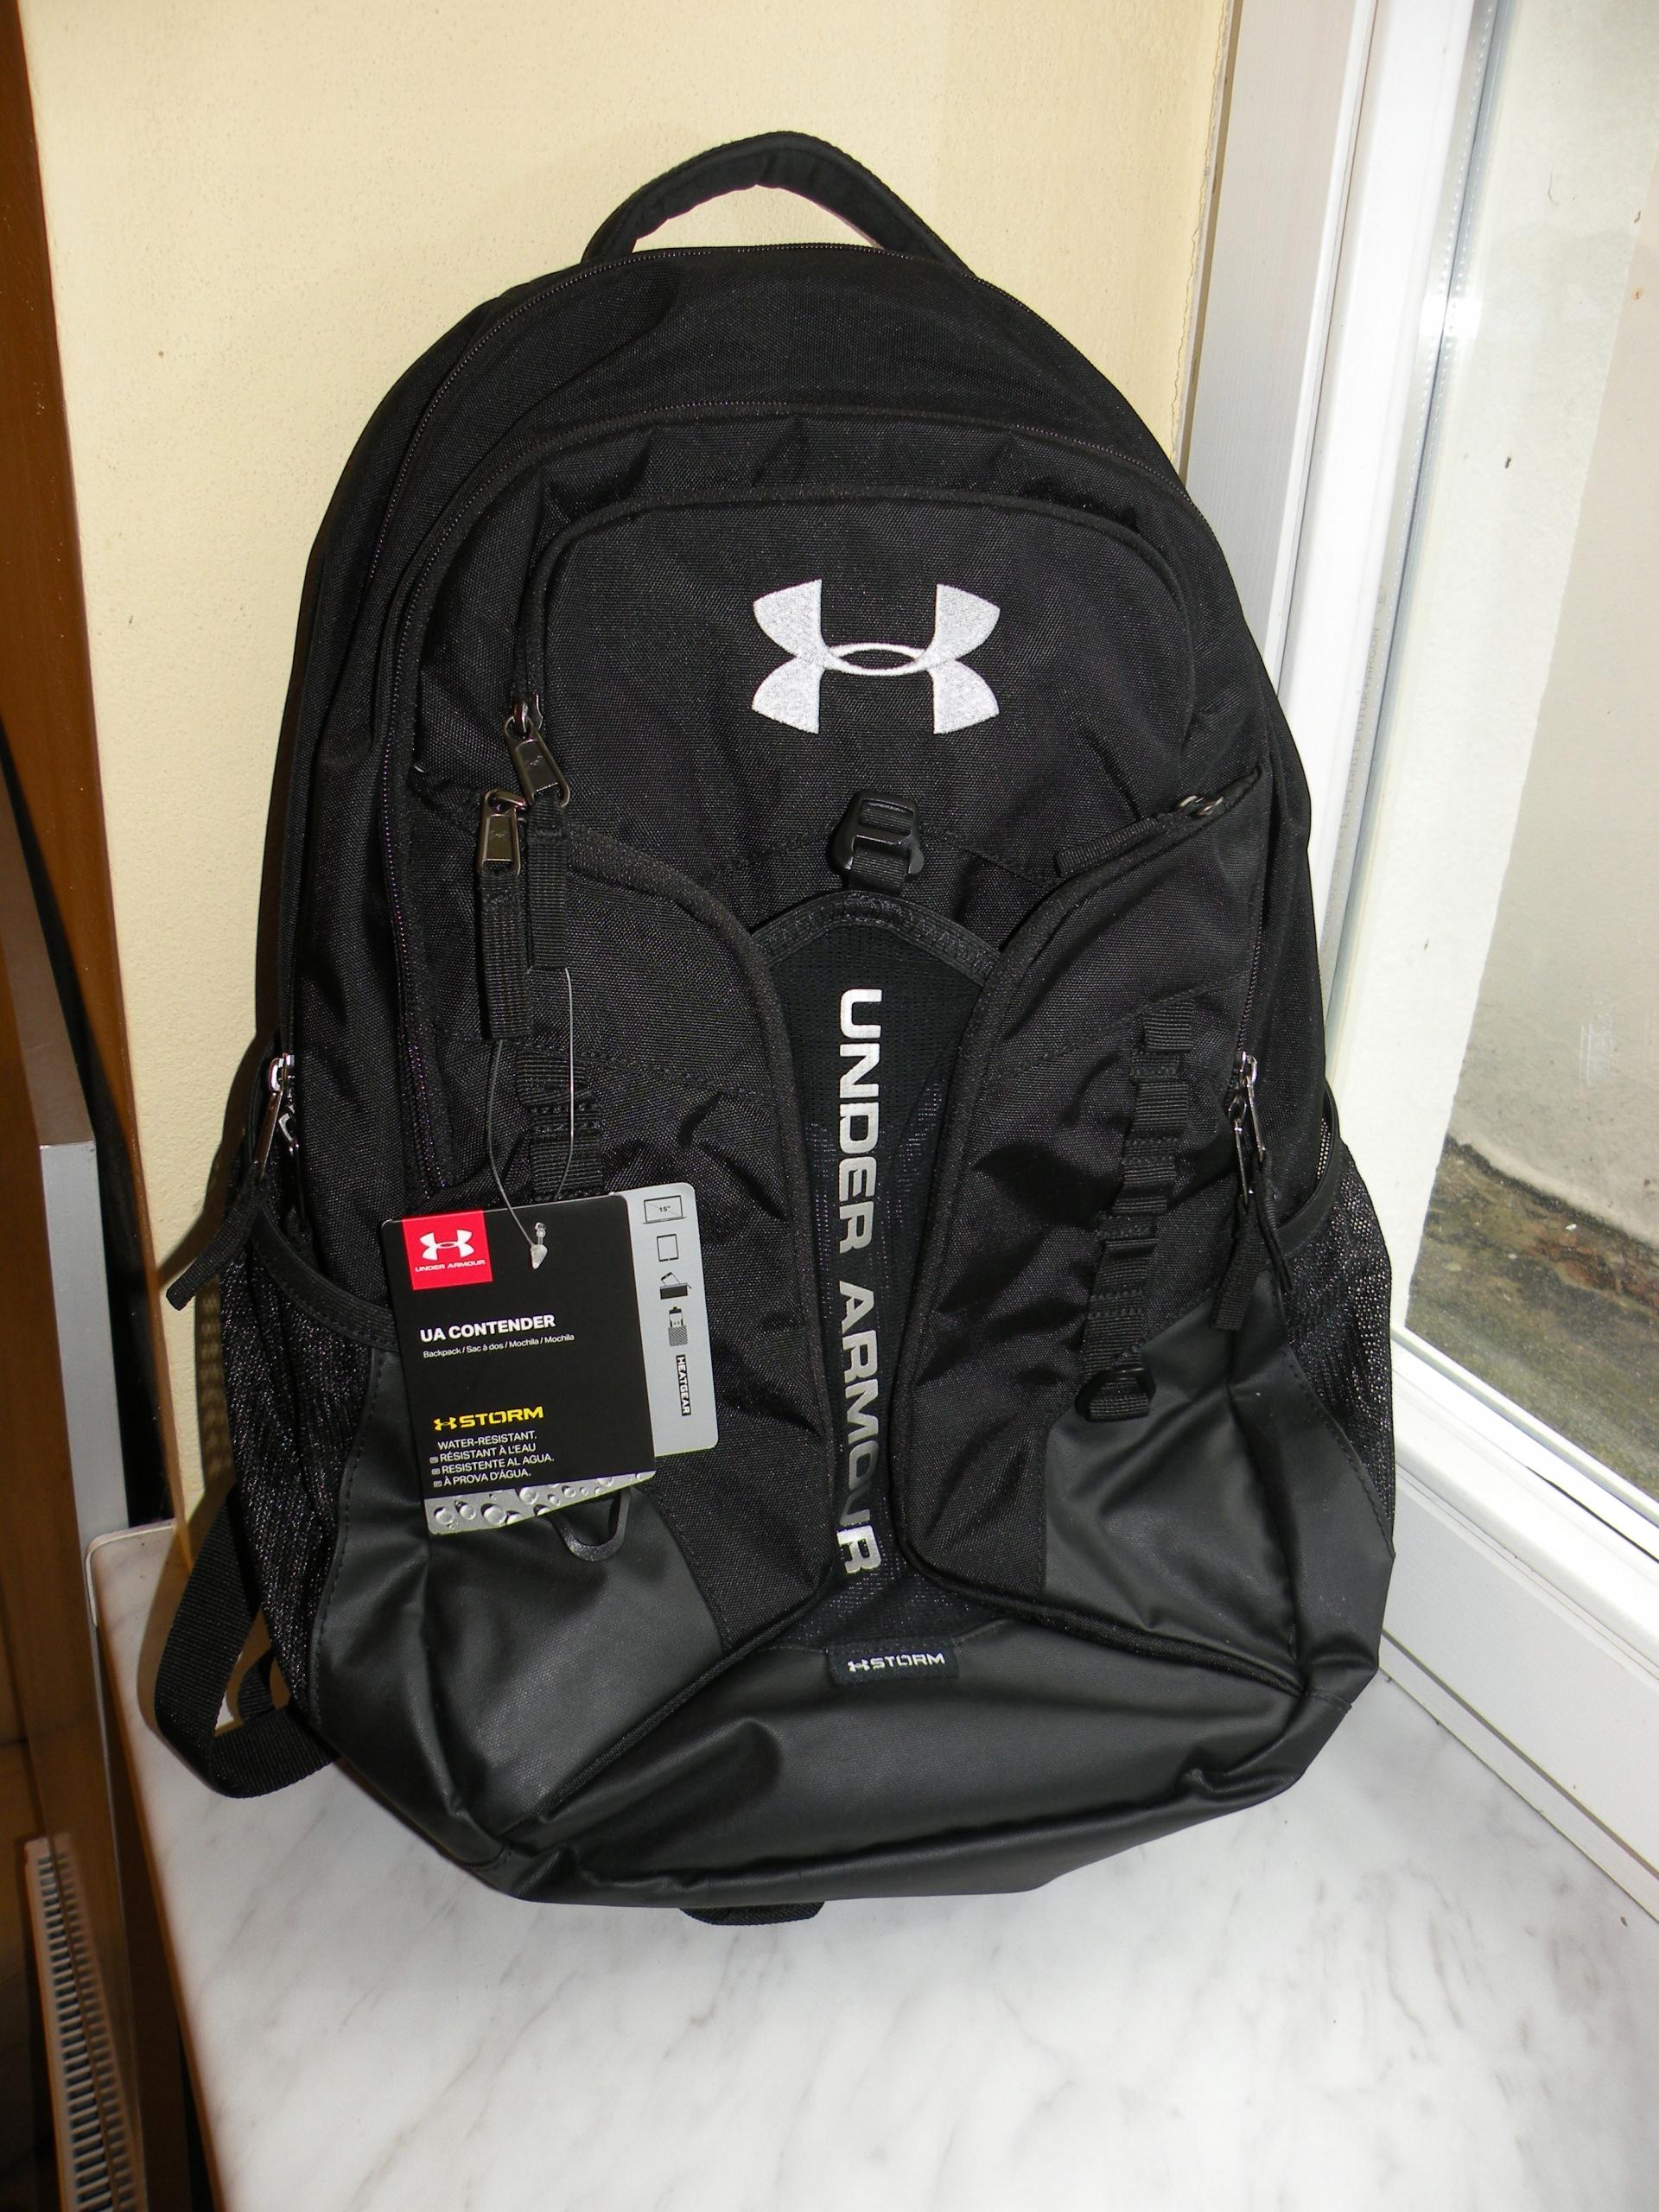 a67030a4caa55 Plecak sportowy UA Contender Backpack 34L - 7686356788 - oficjalne ...